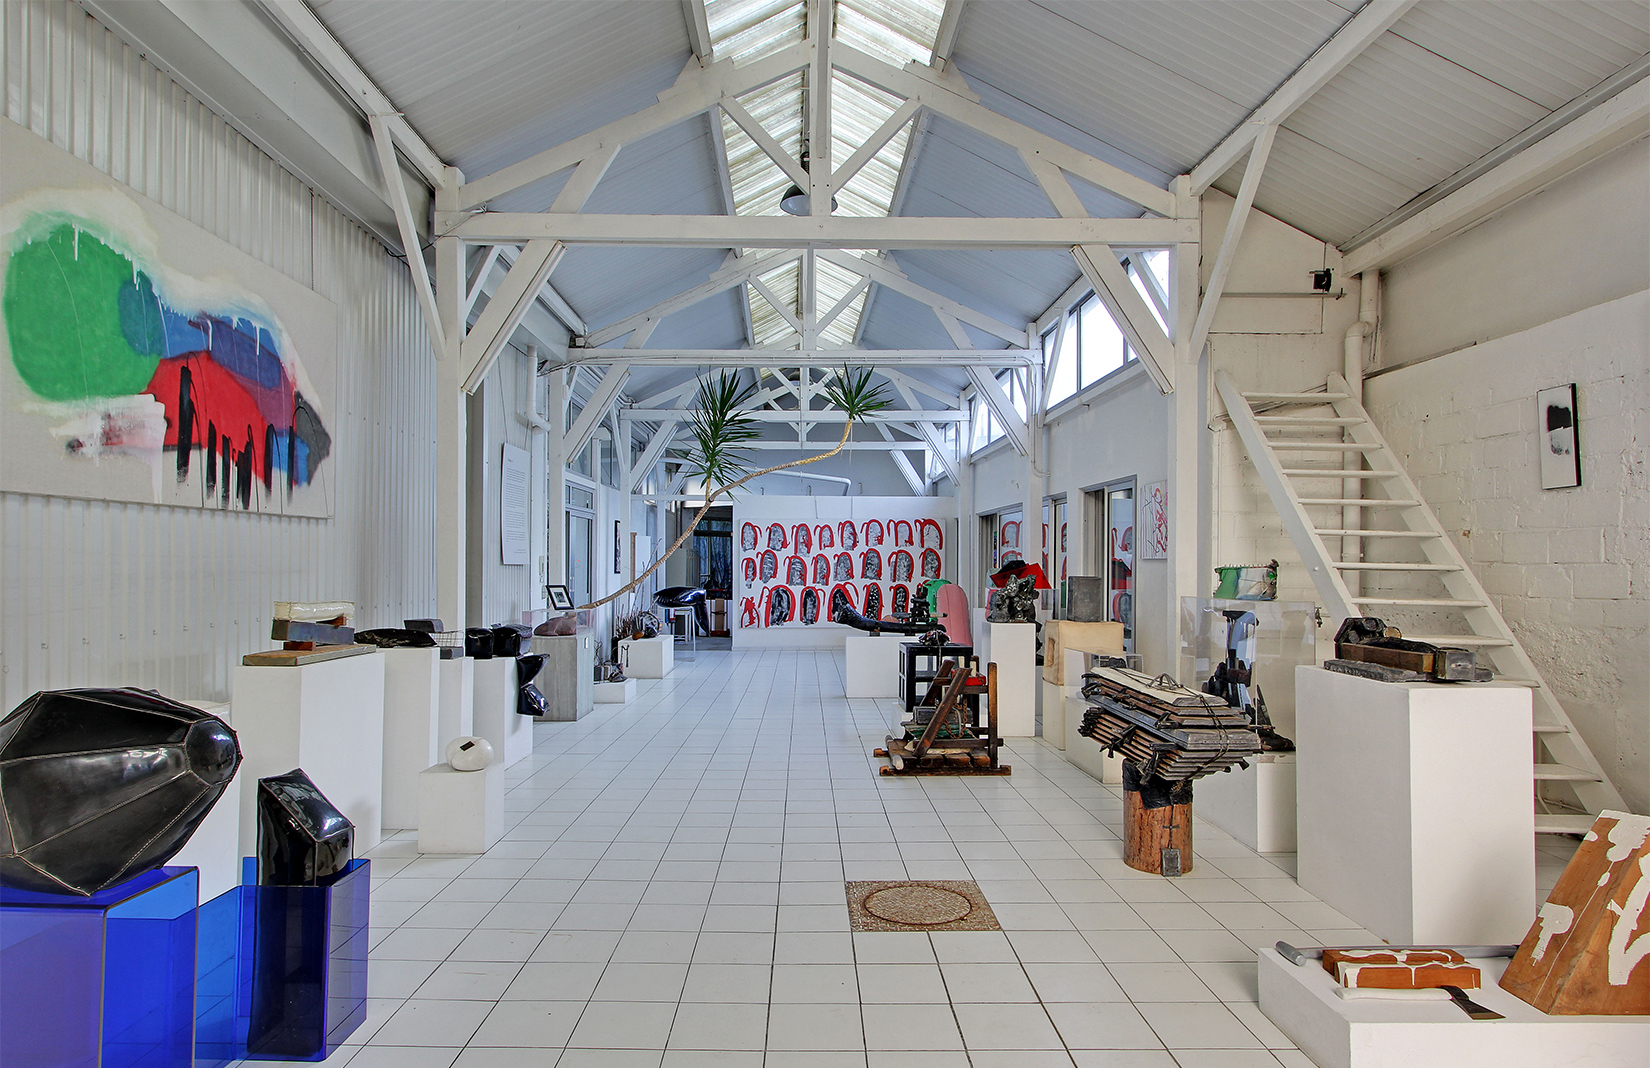 Paris artists home: François Arnal's former factory live/work studio